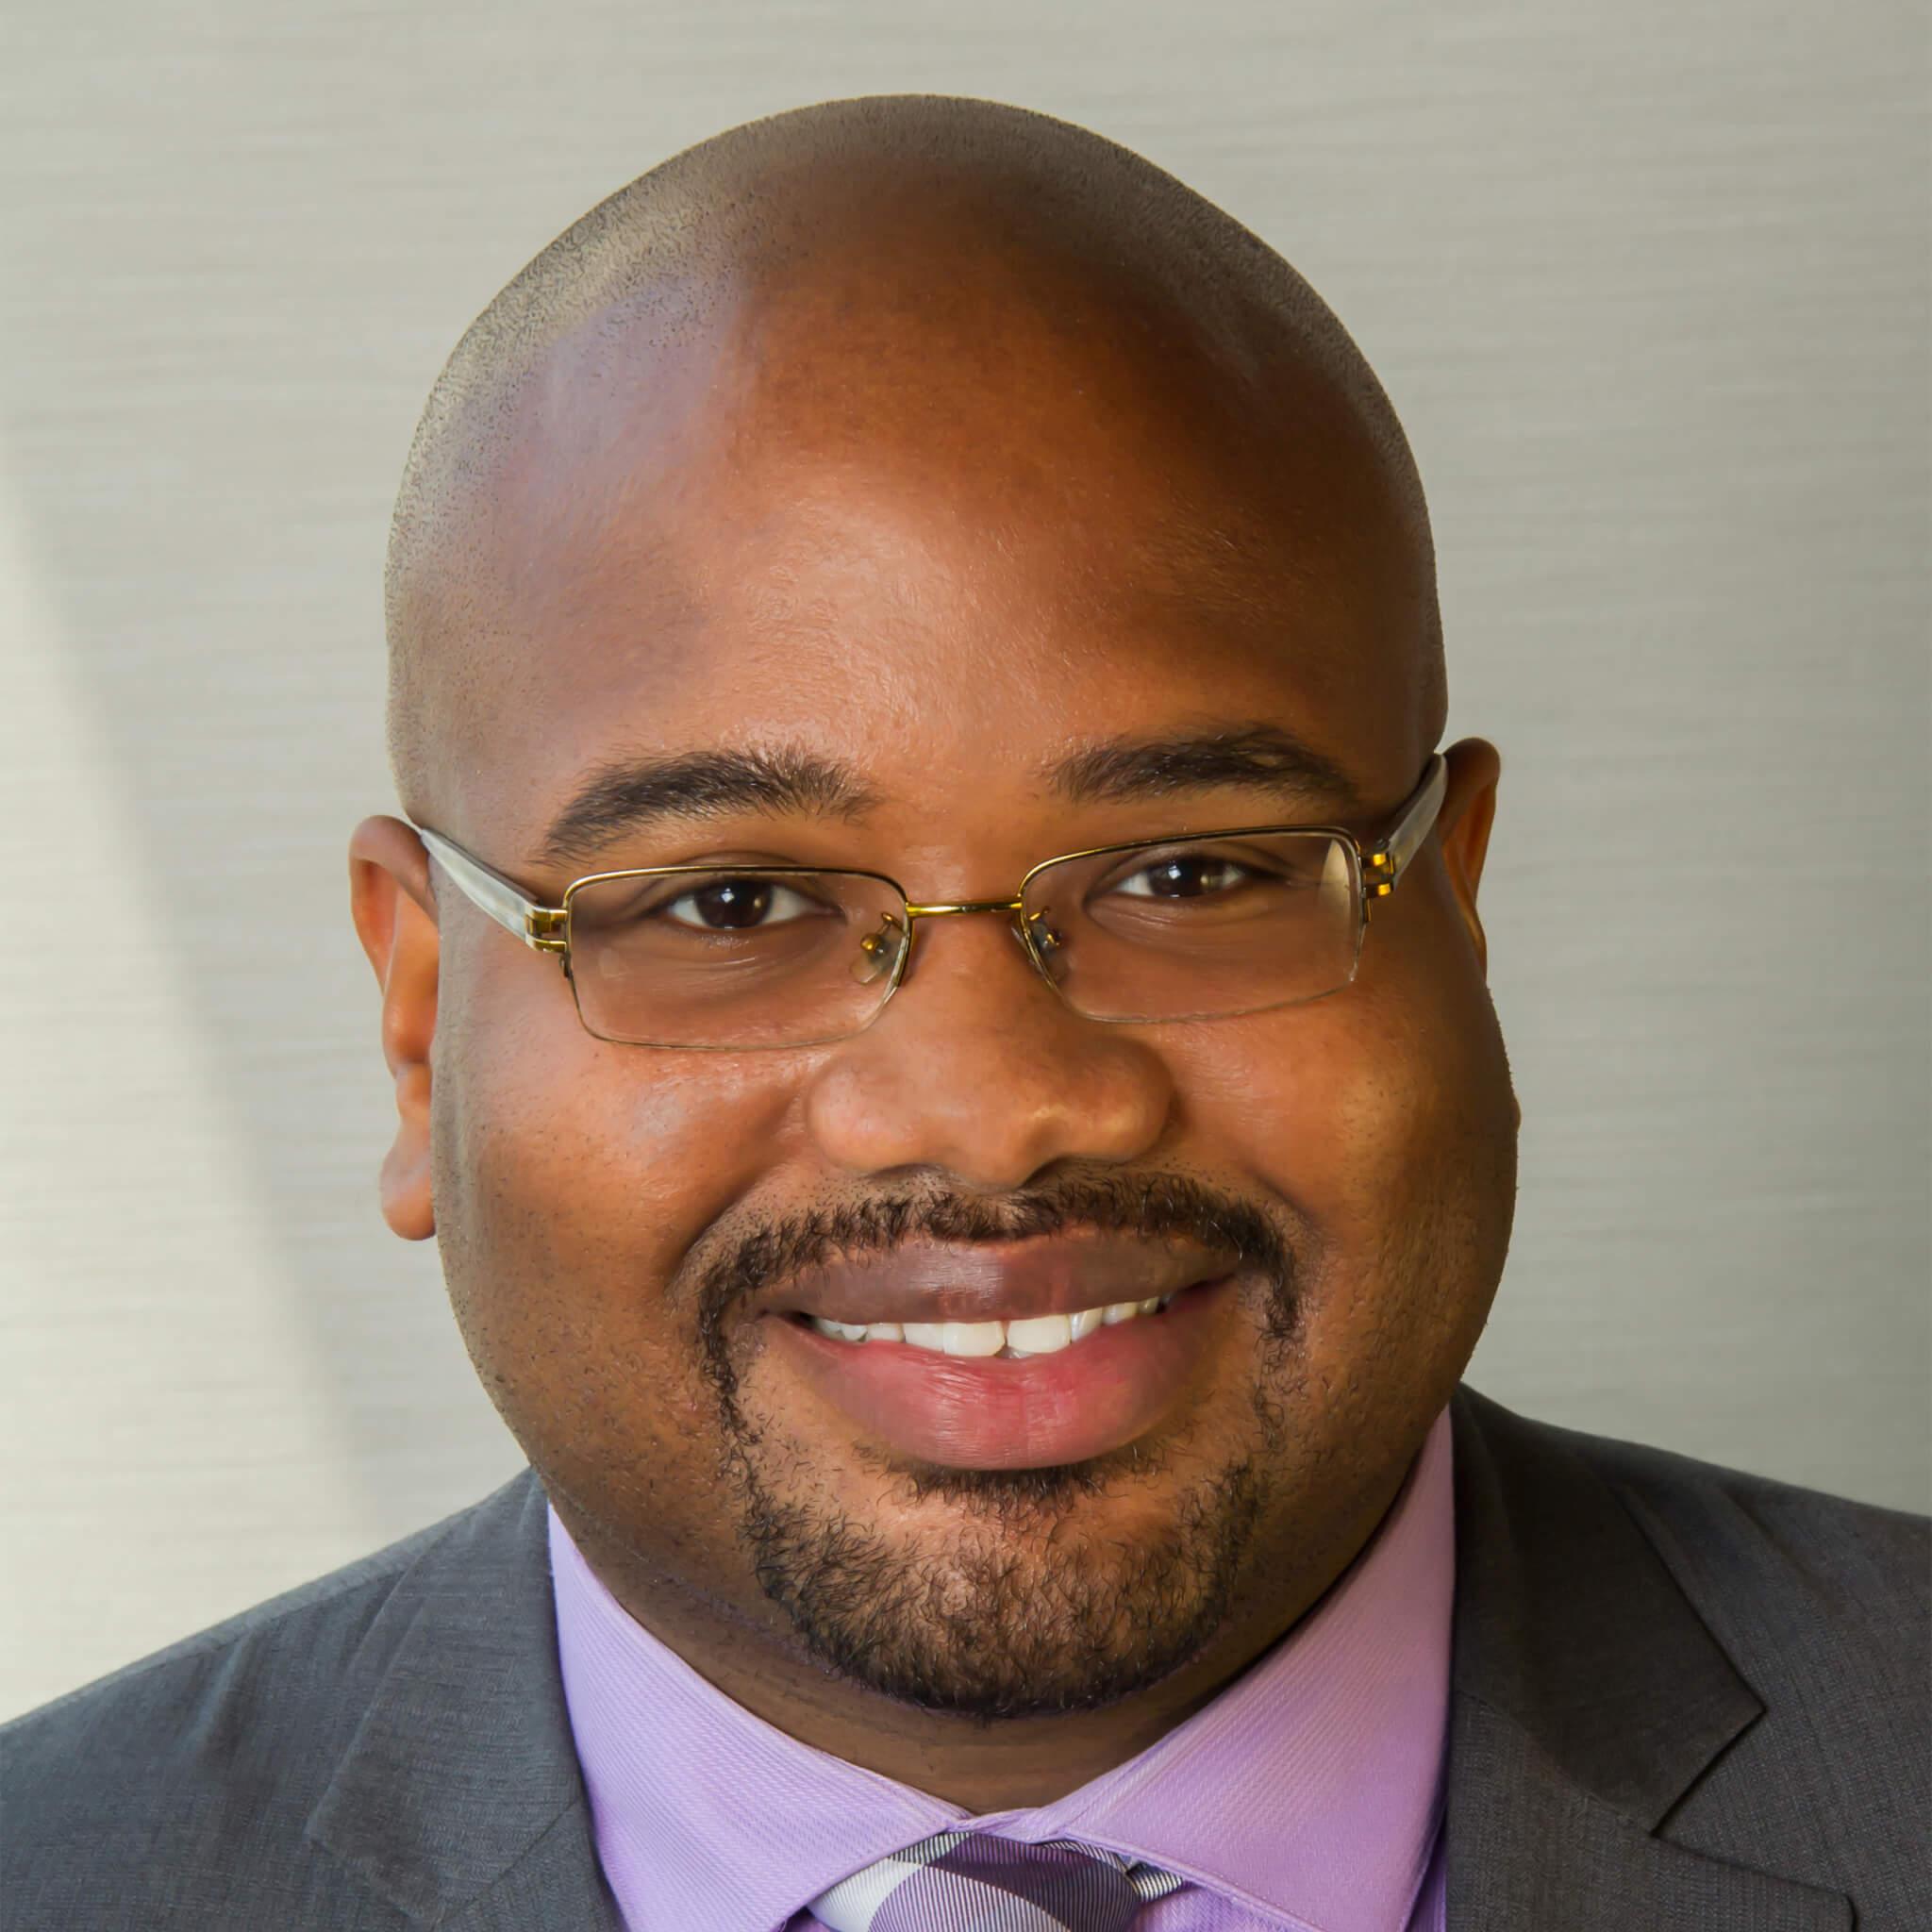 Portrait of current Deputy Director of External Affairs